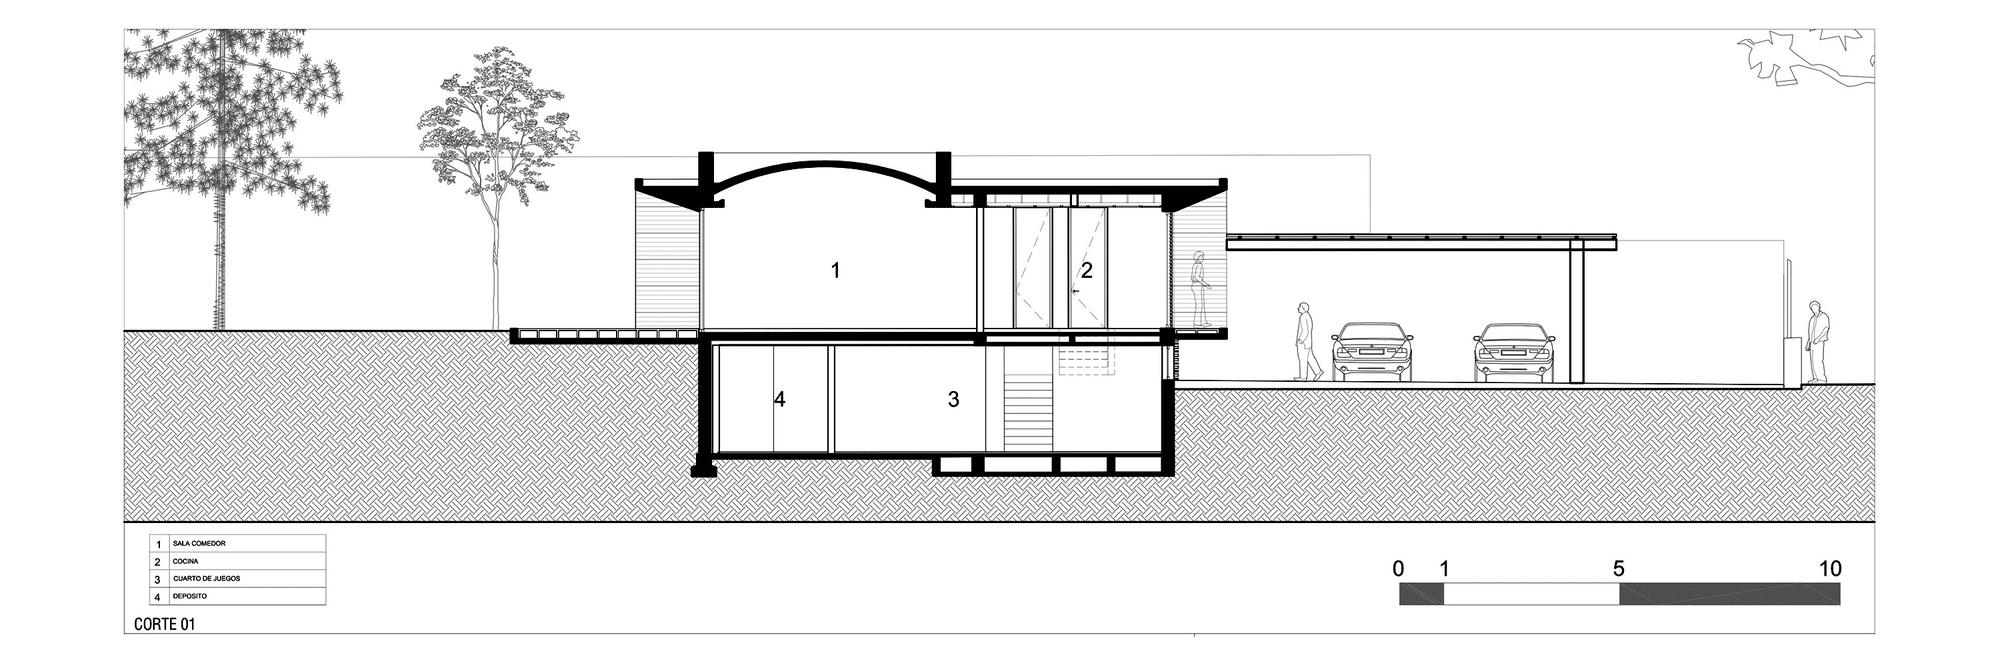 Moderno dise o casa de un piso con planos construye hogar for Plano casa una planta